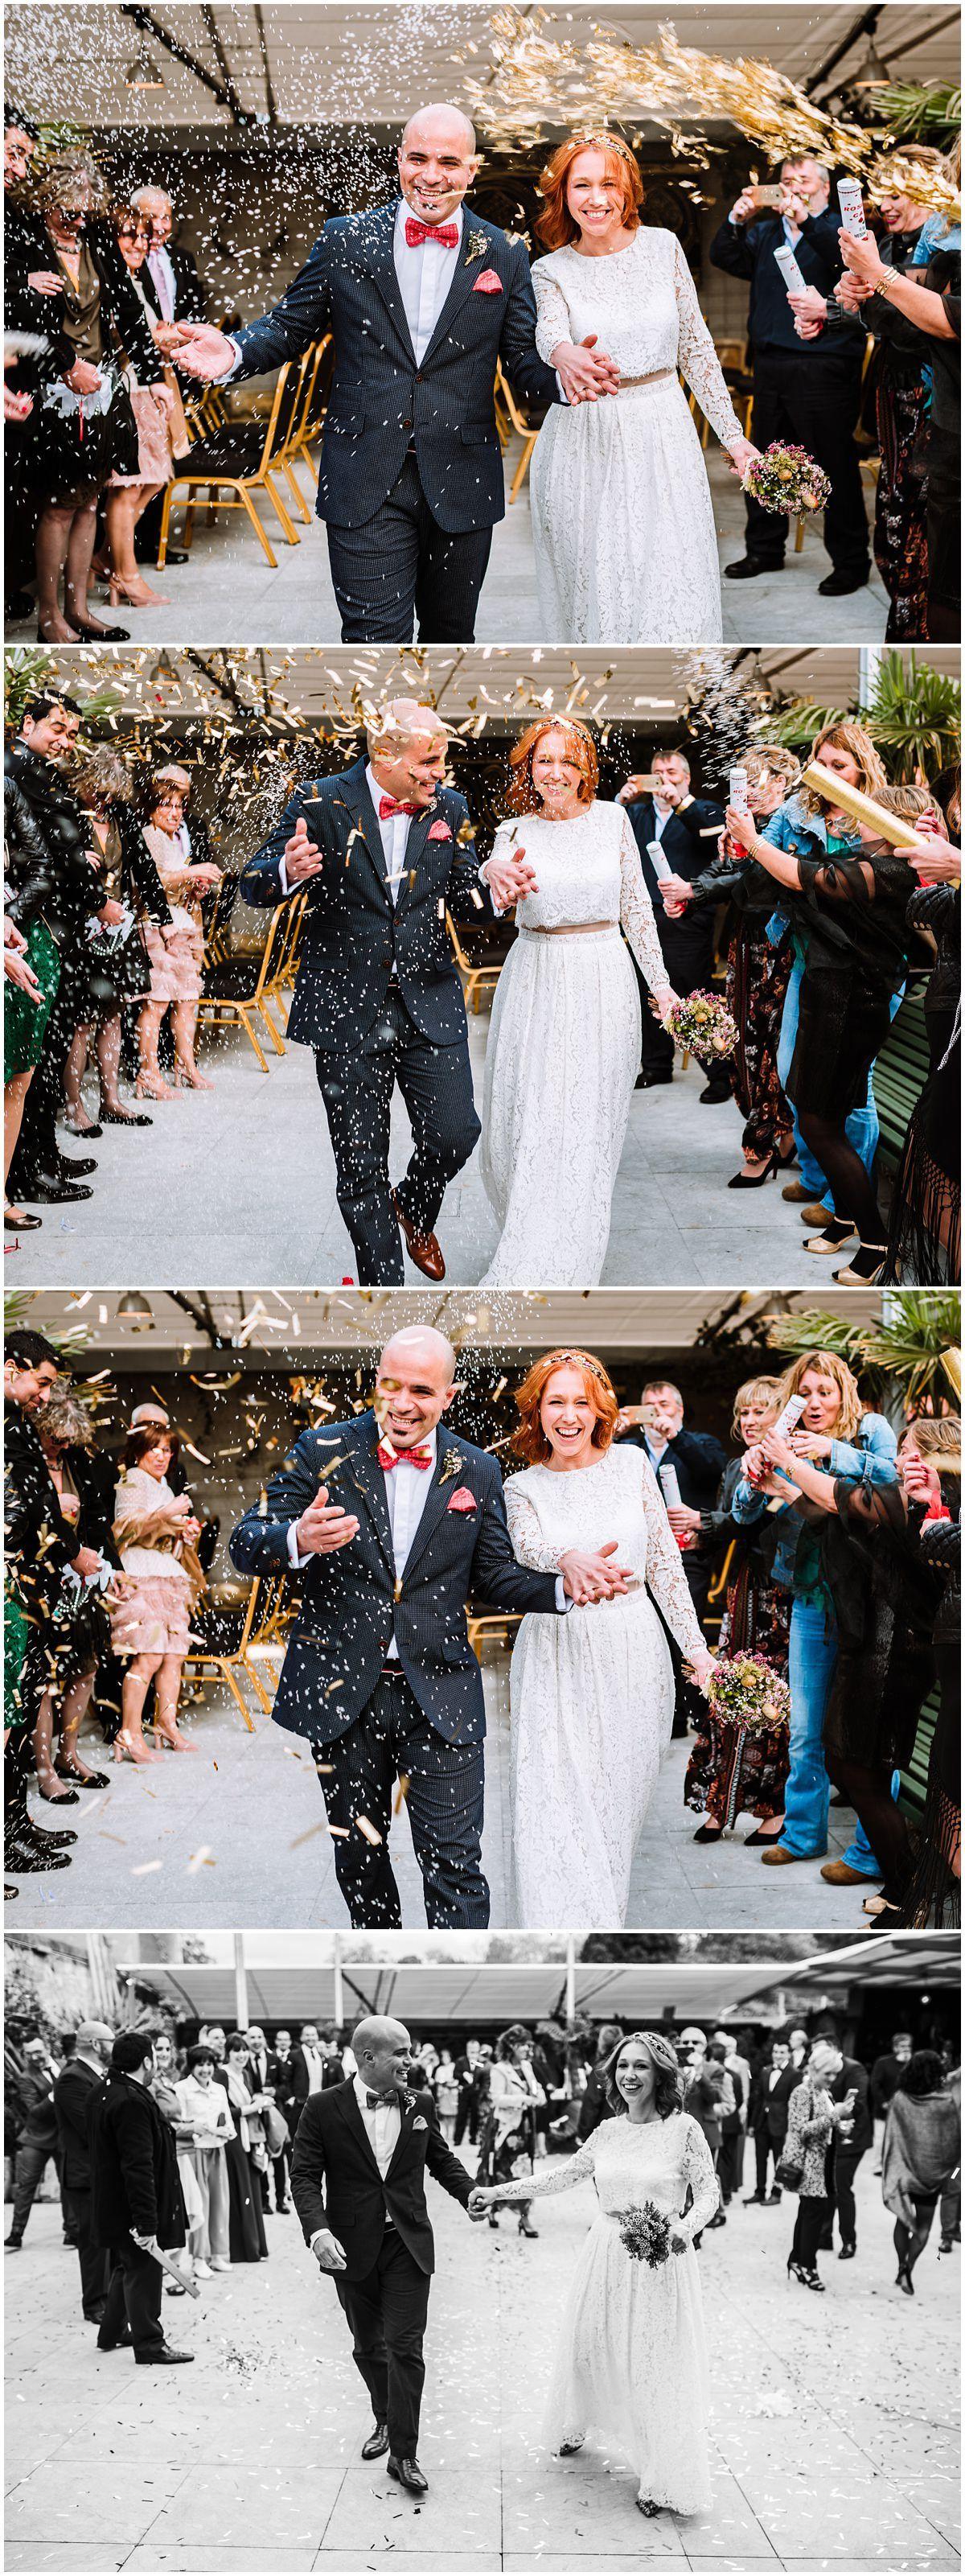 Ceremonia de boda en Avilés Foto